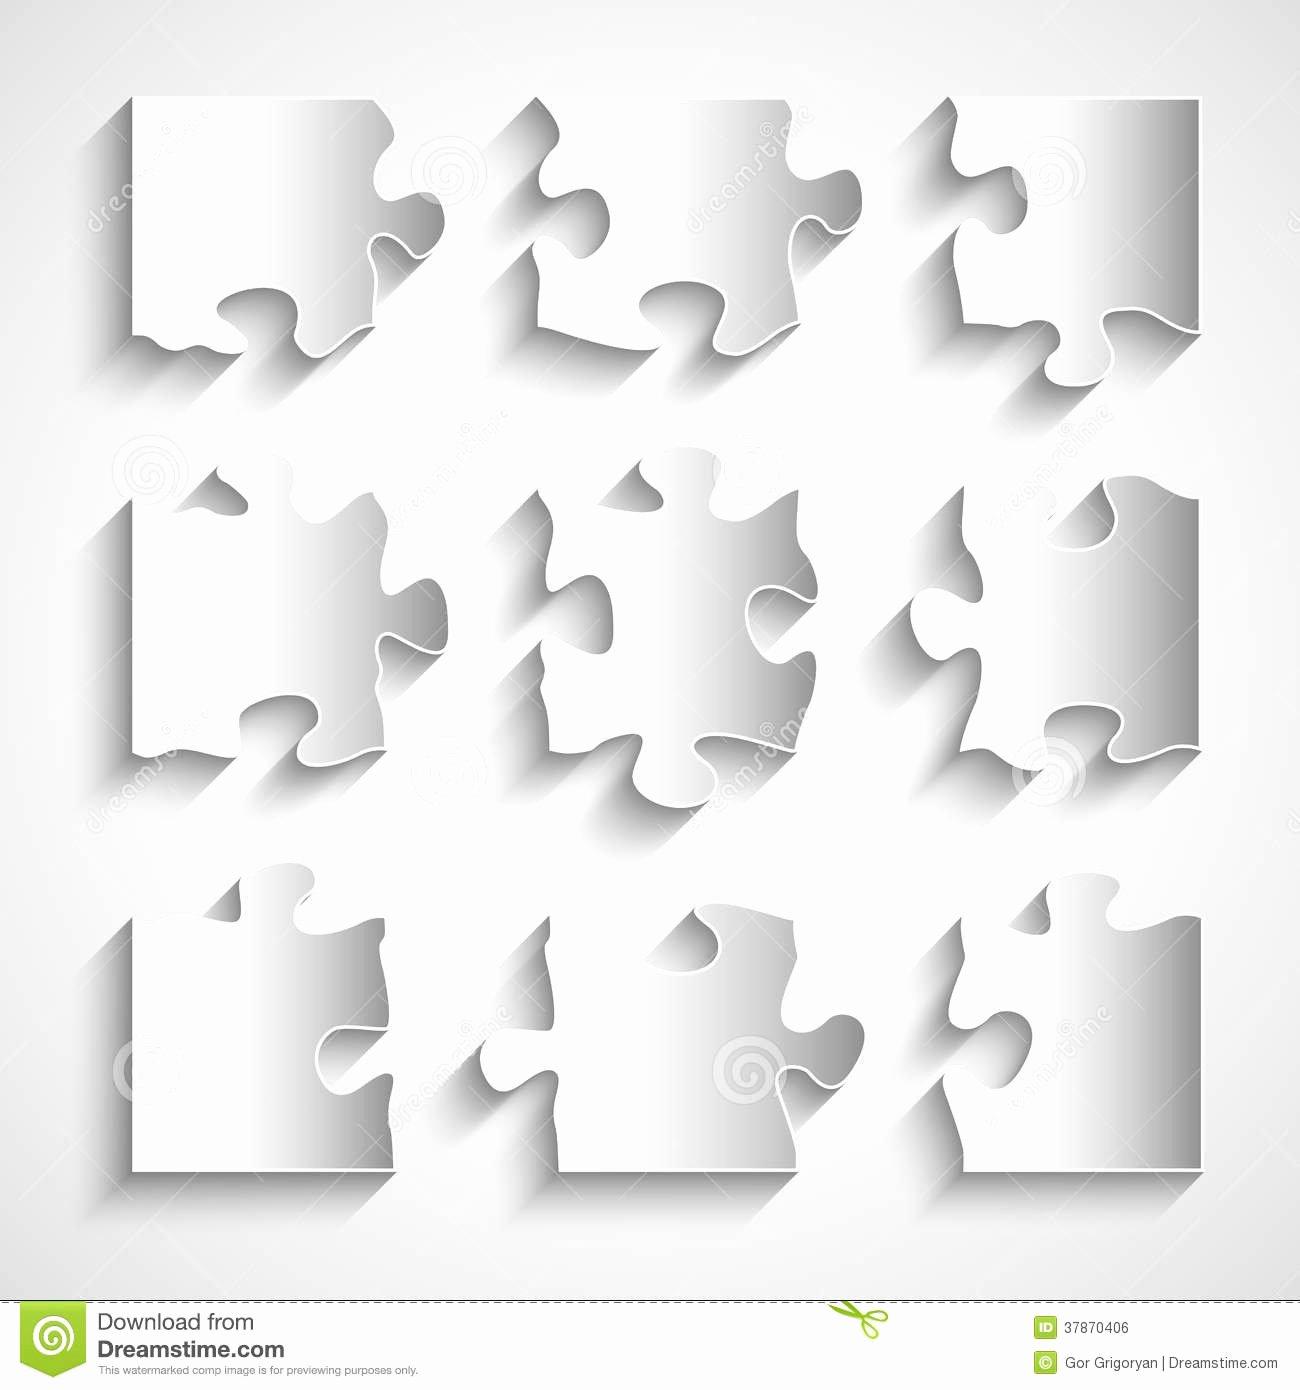 8 Piece Puzzle Template Inspirational Flat Design 9 Piece Puzzle Template Stock Vector